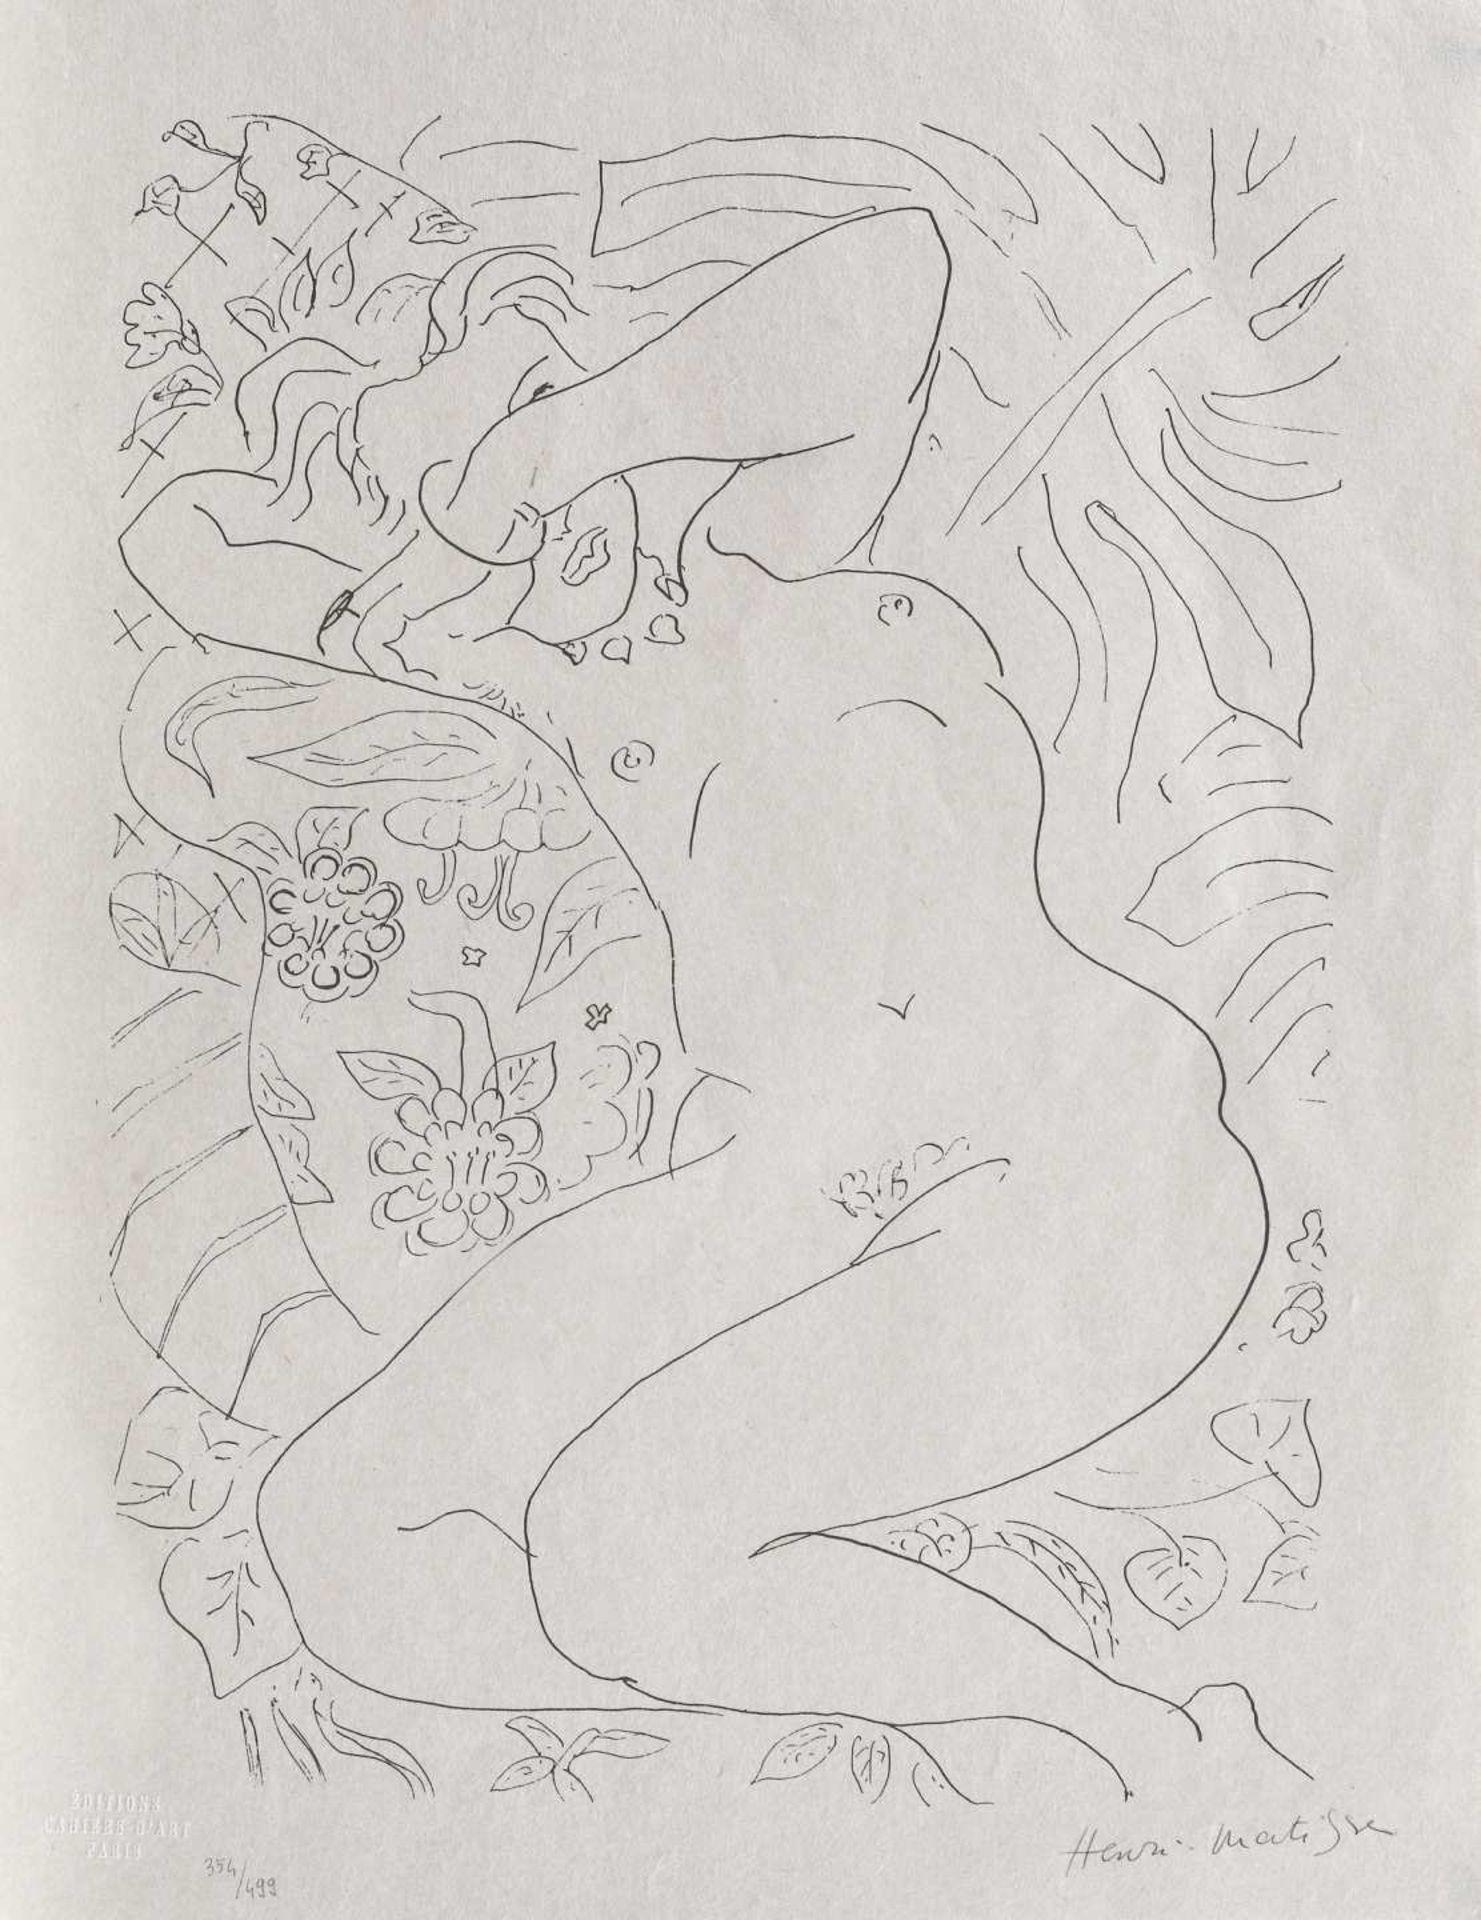 Henri Matisse, Madame Dorothy Taley Henri Matisse, Madame Dorothy Taley, chromolithography, 60 × 46